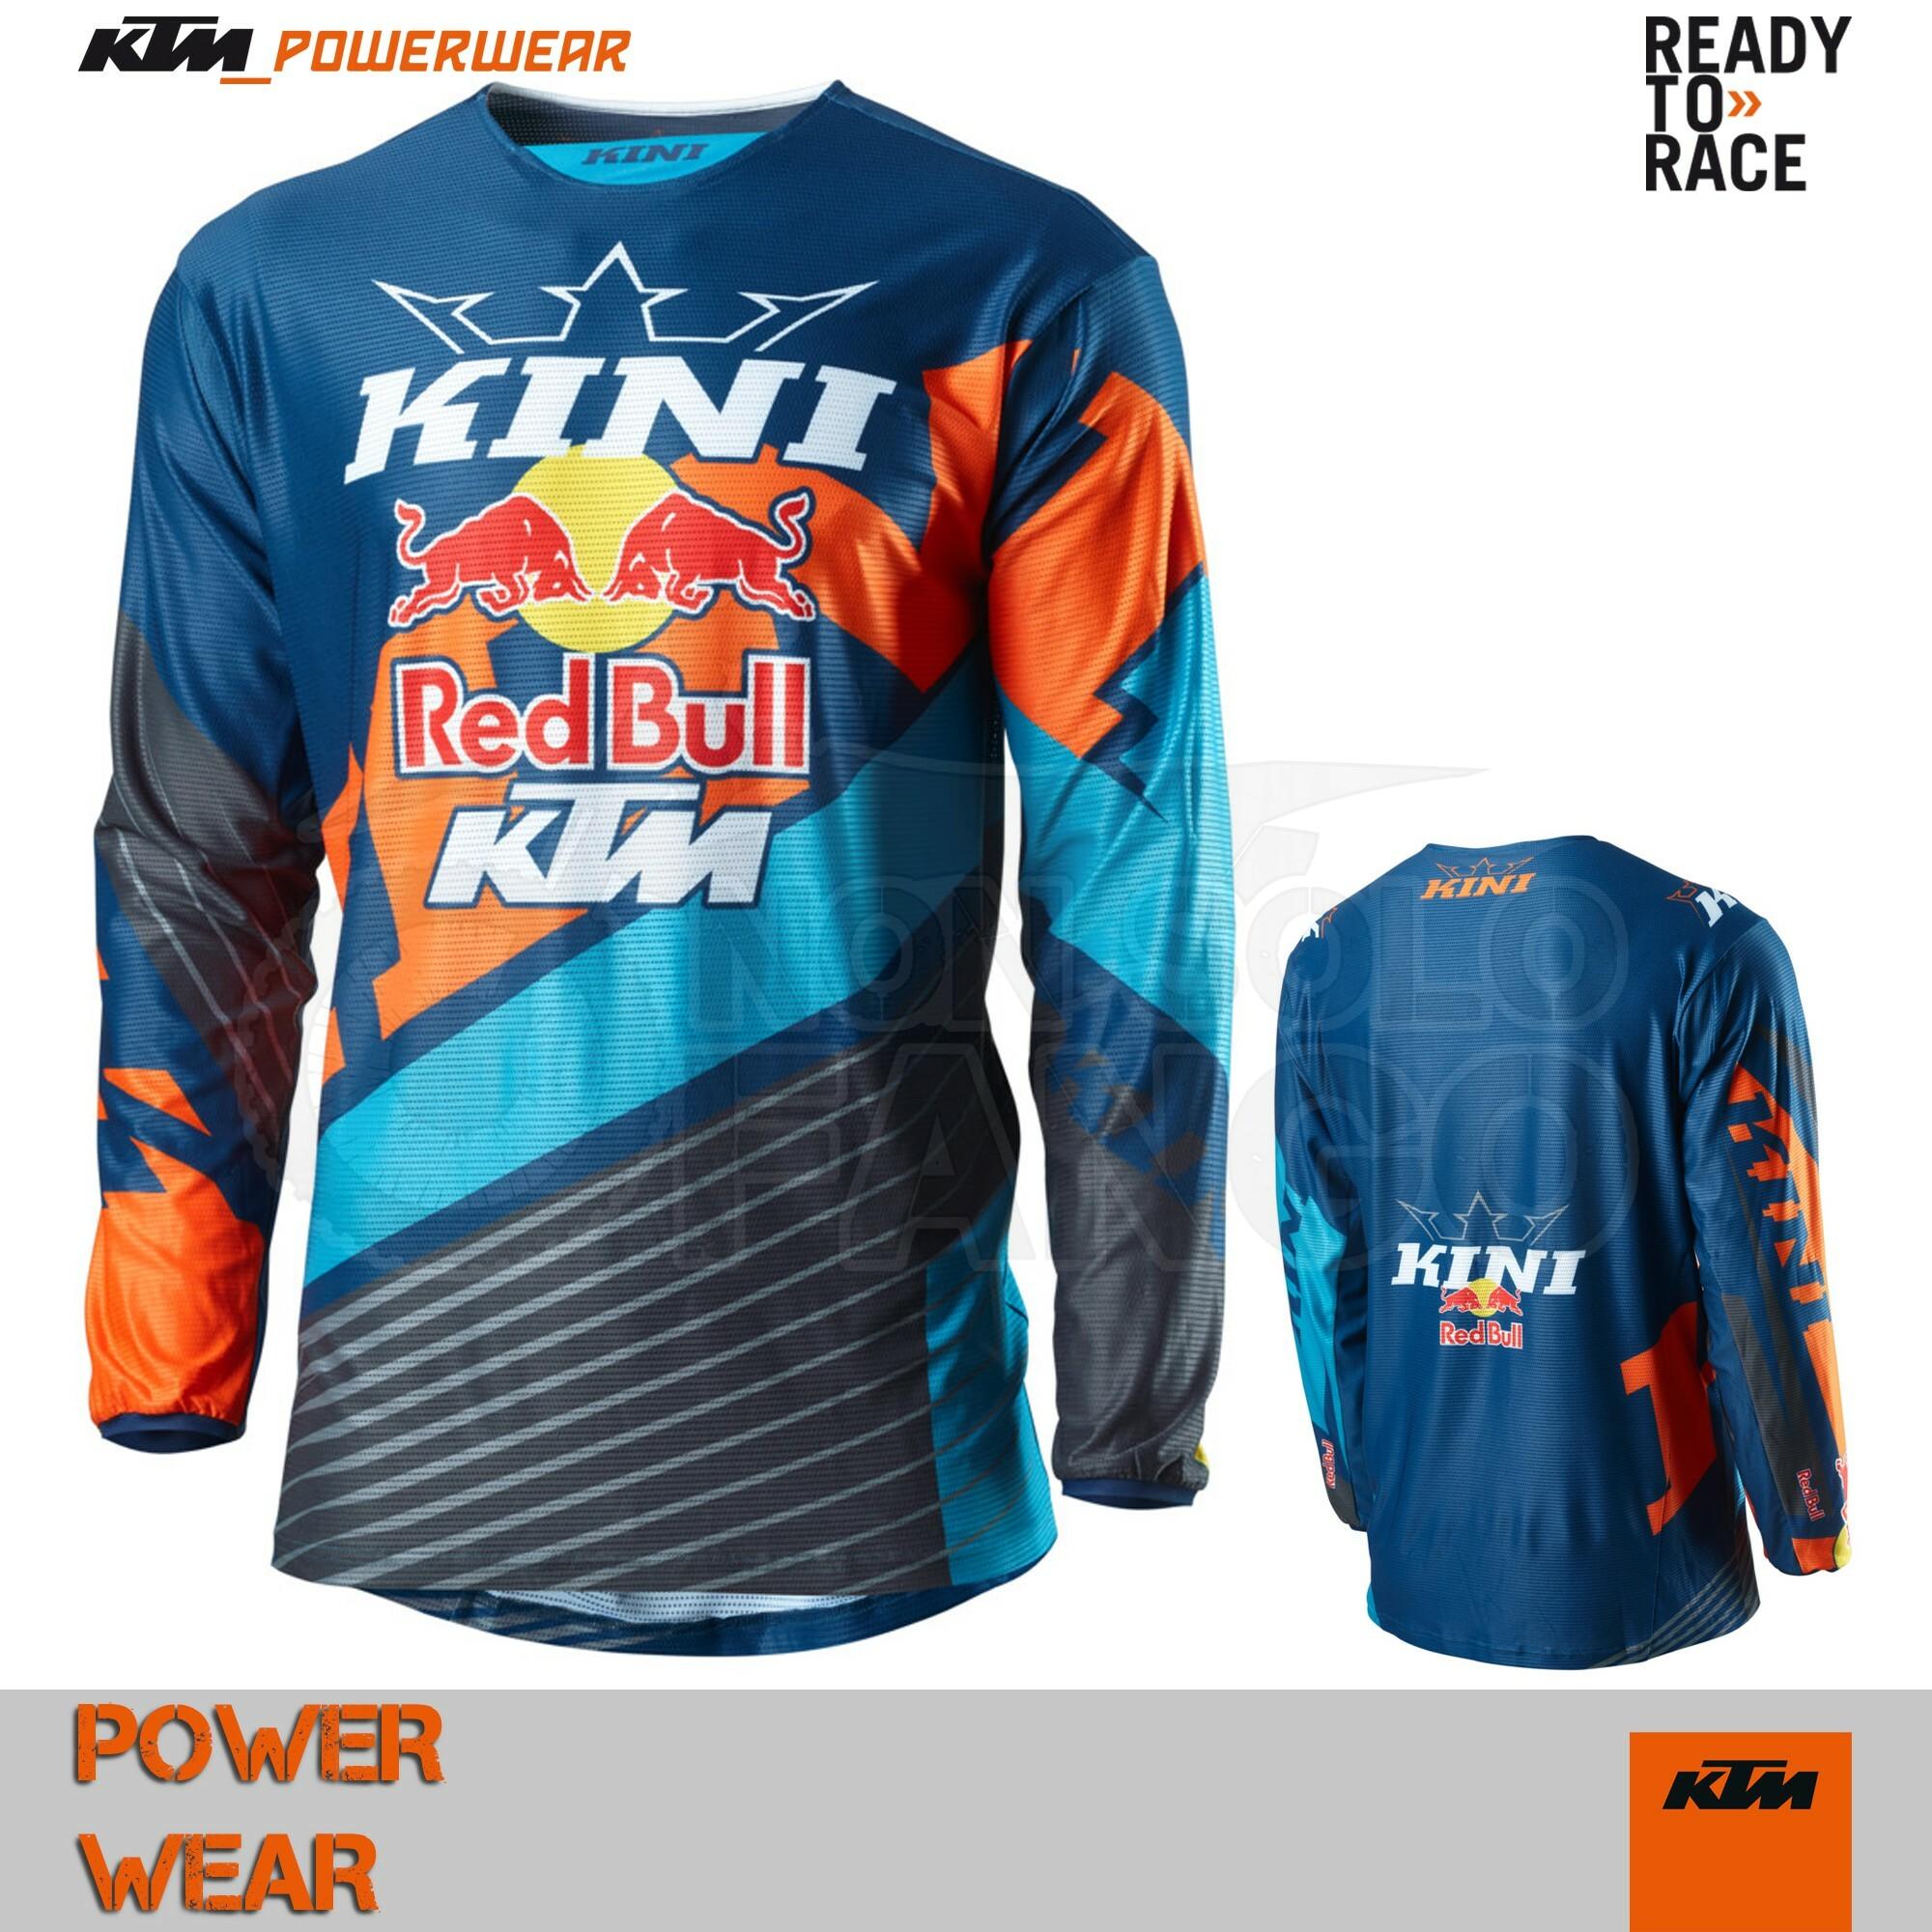 KINI-RB COMPETITION JACKET: KTM Wien